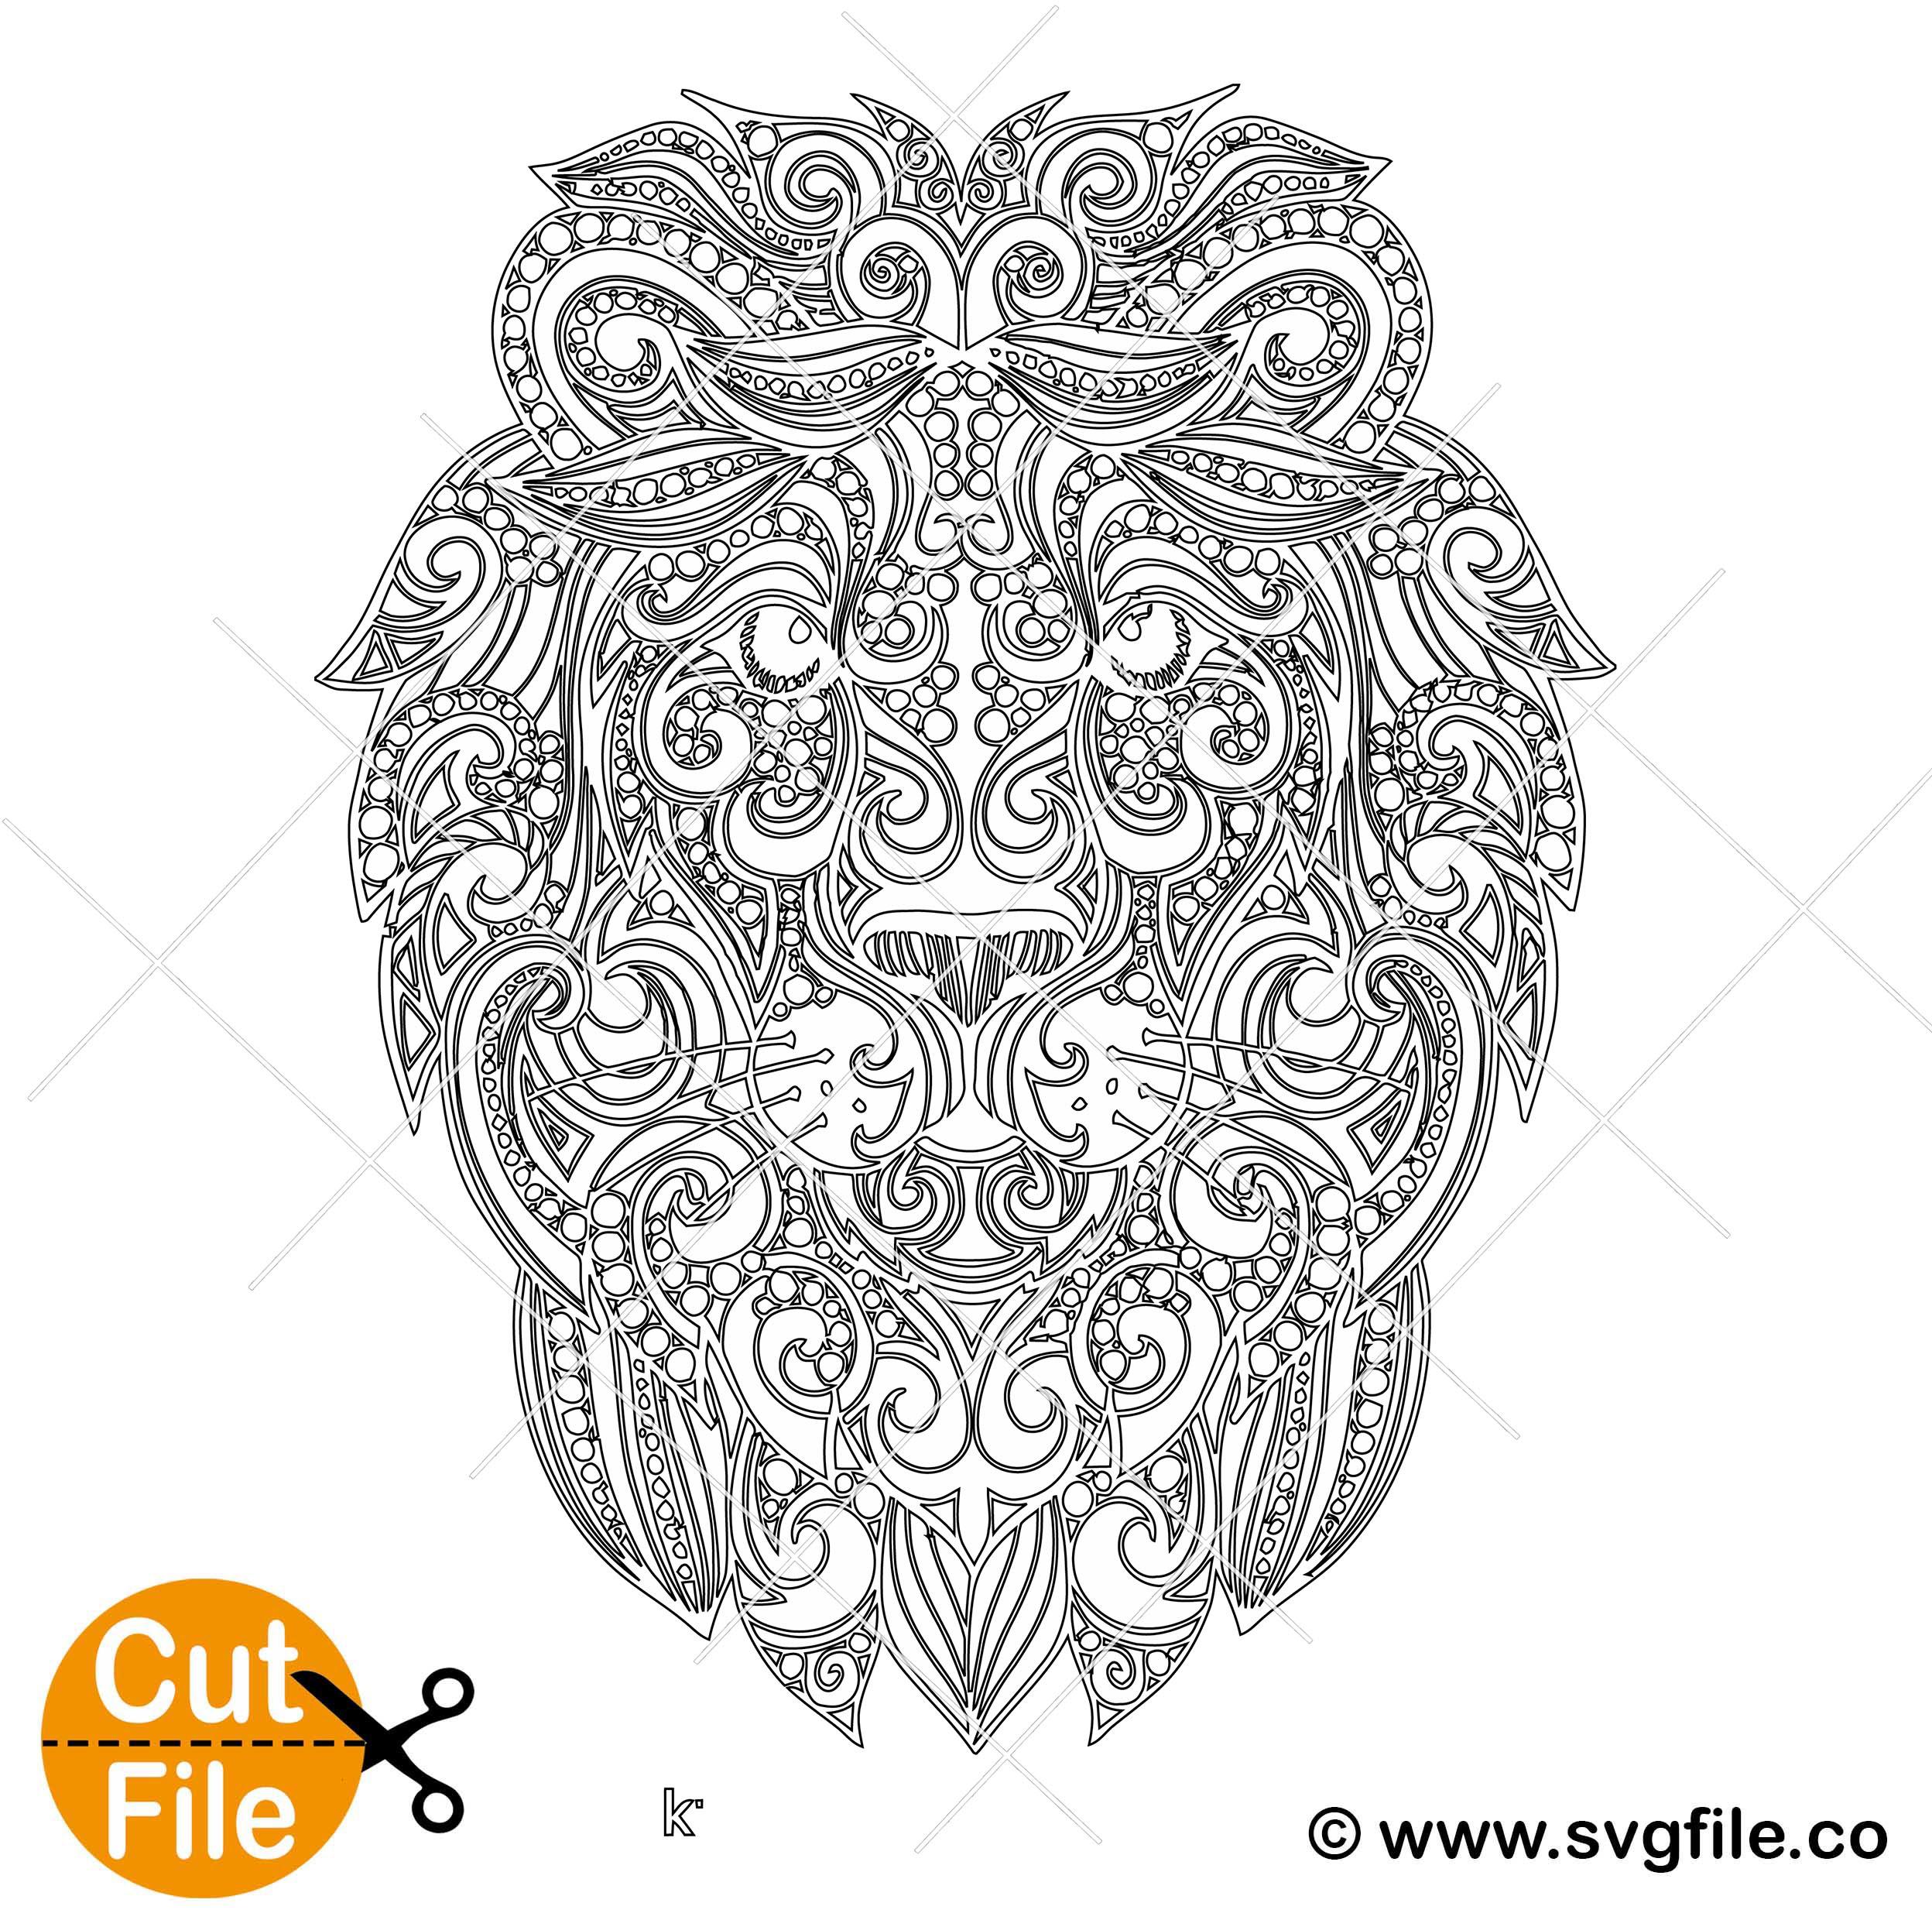 Download Lion Mandala SVG - 0.99 Cent SVG Files - Life Time Access